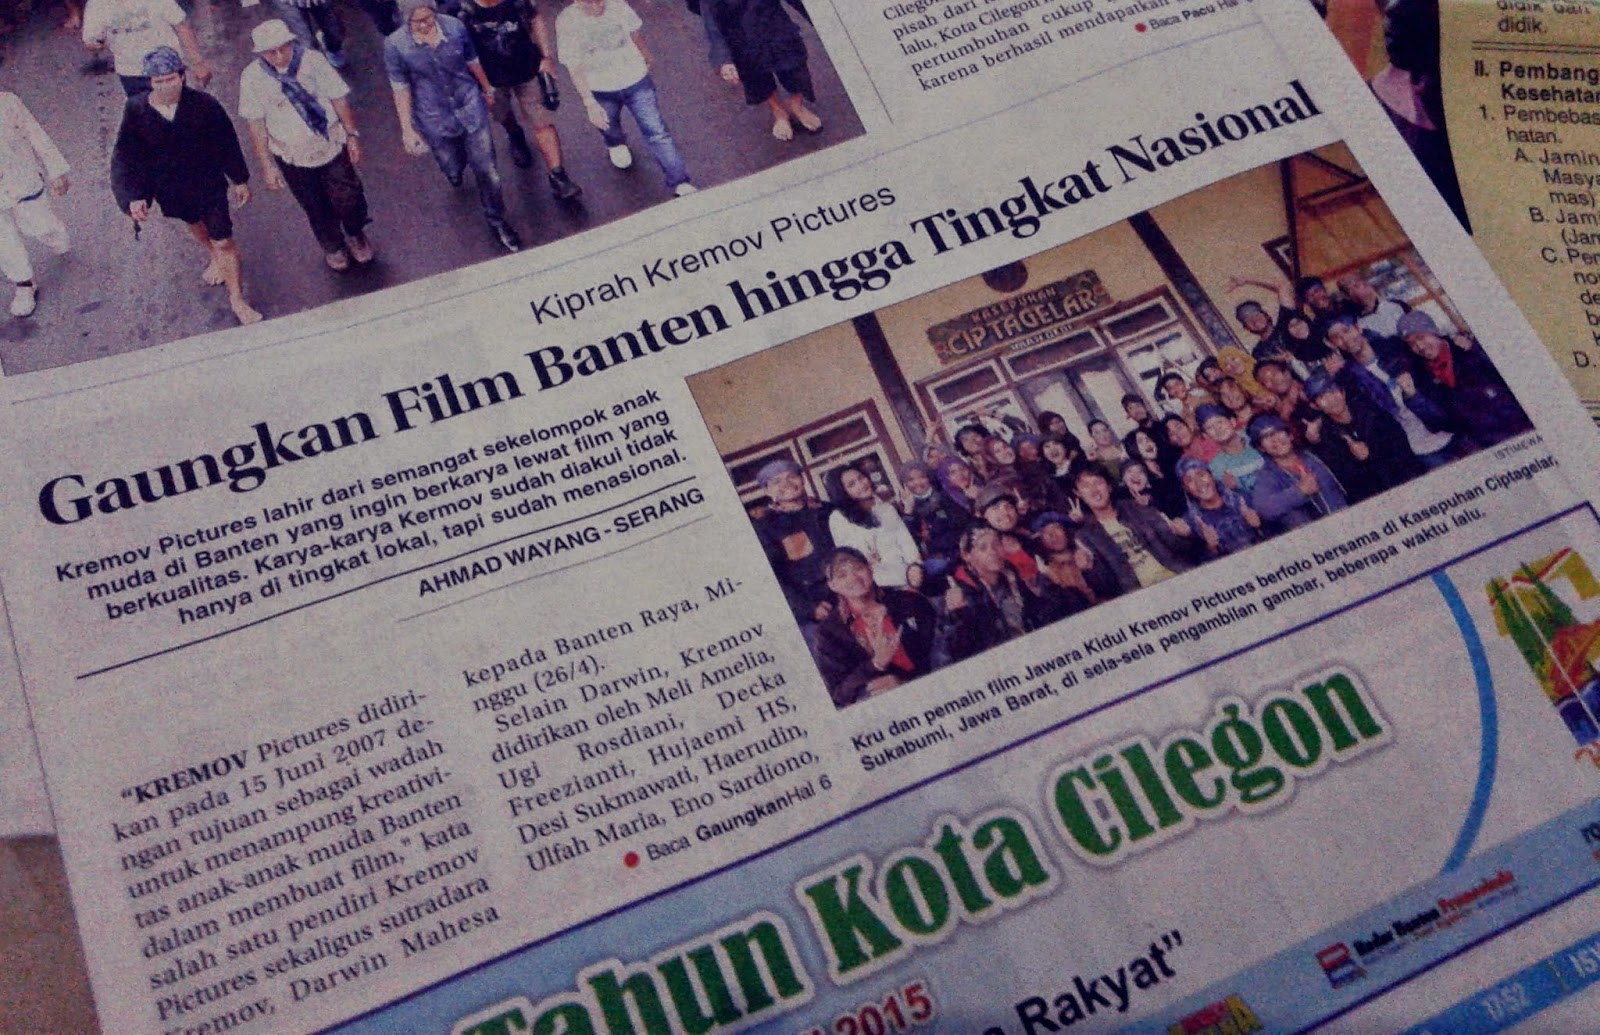 Kiprah Kremov Pictures, Gaungkan Film Banten Hingga Tingkat Nasional